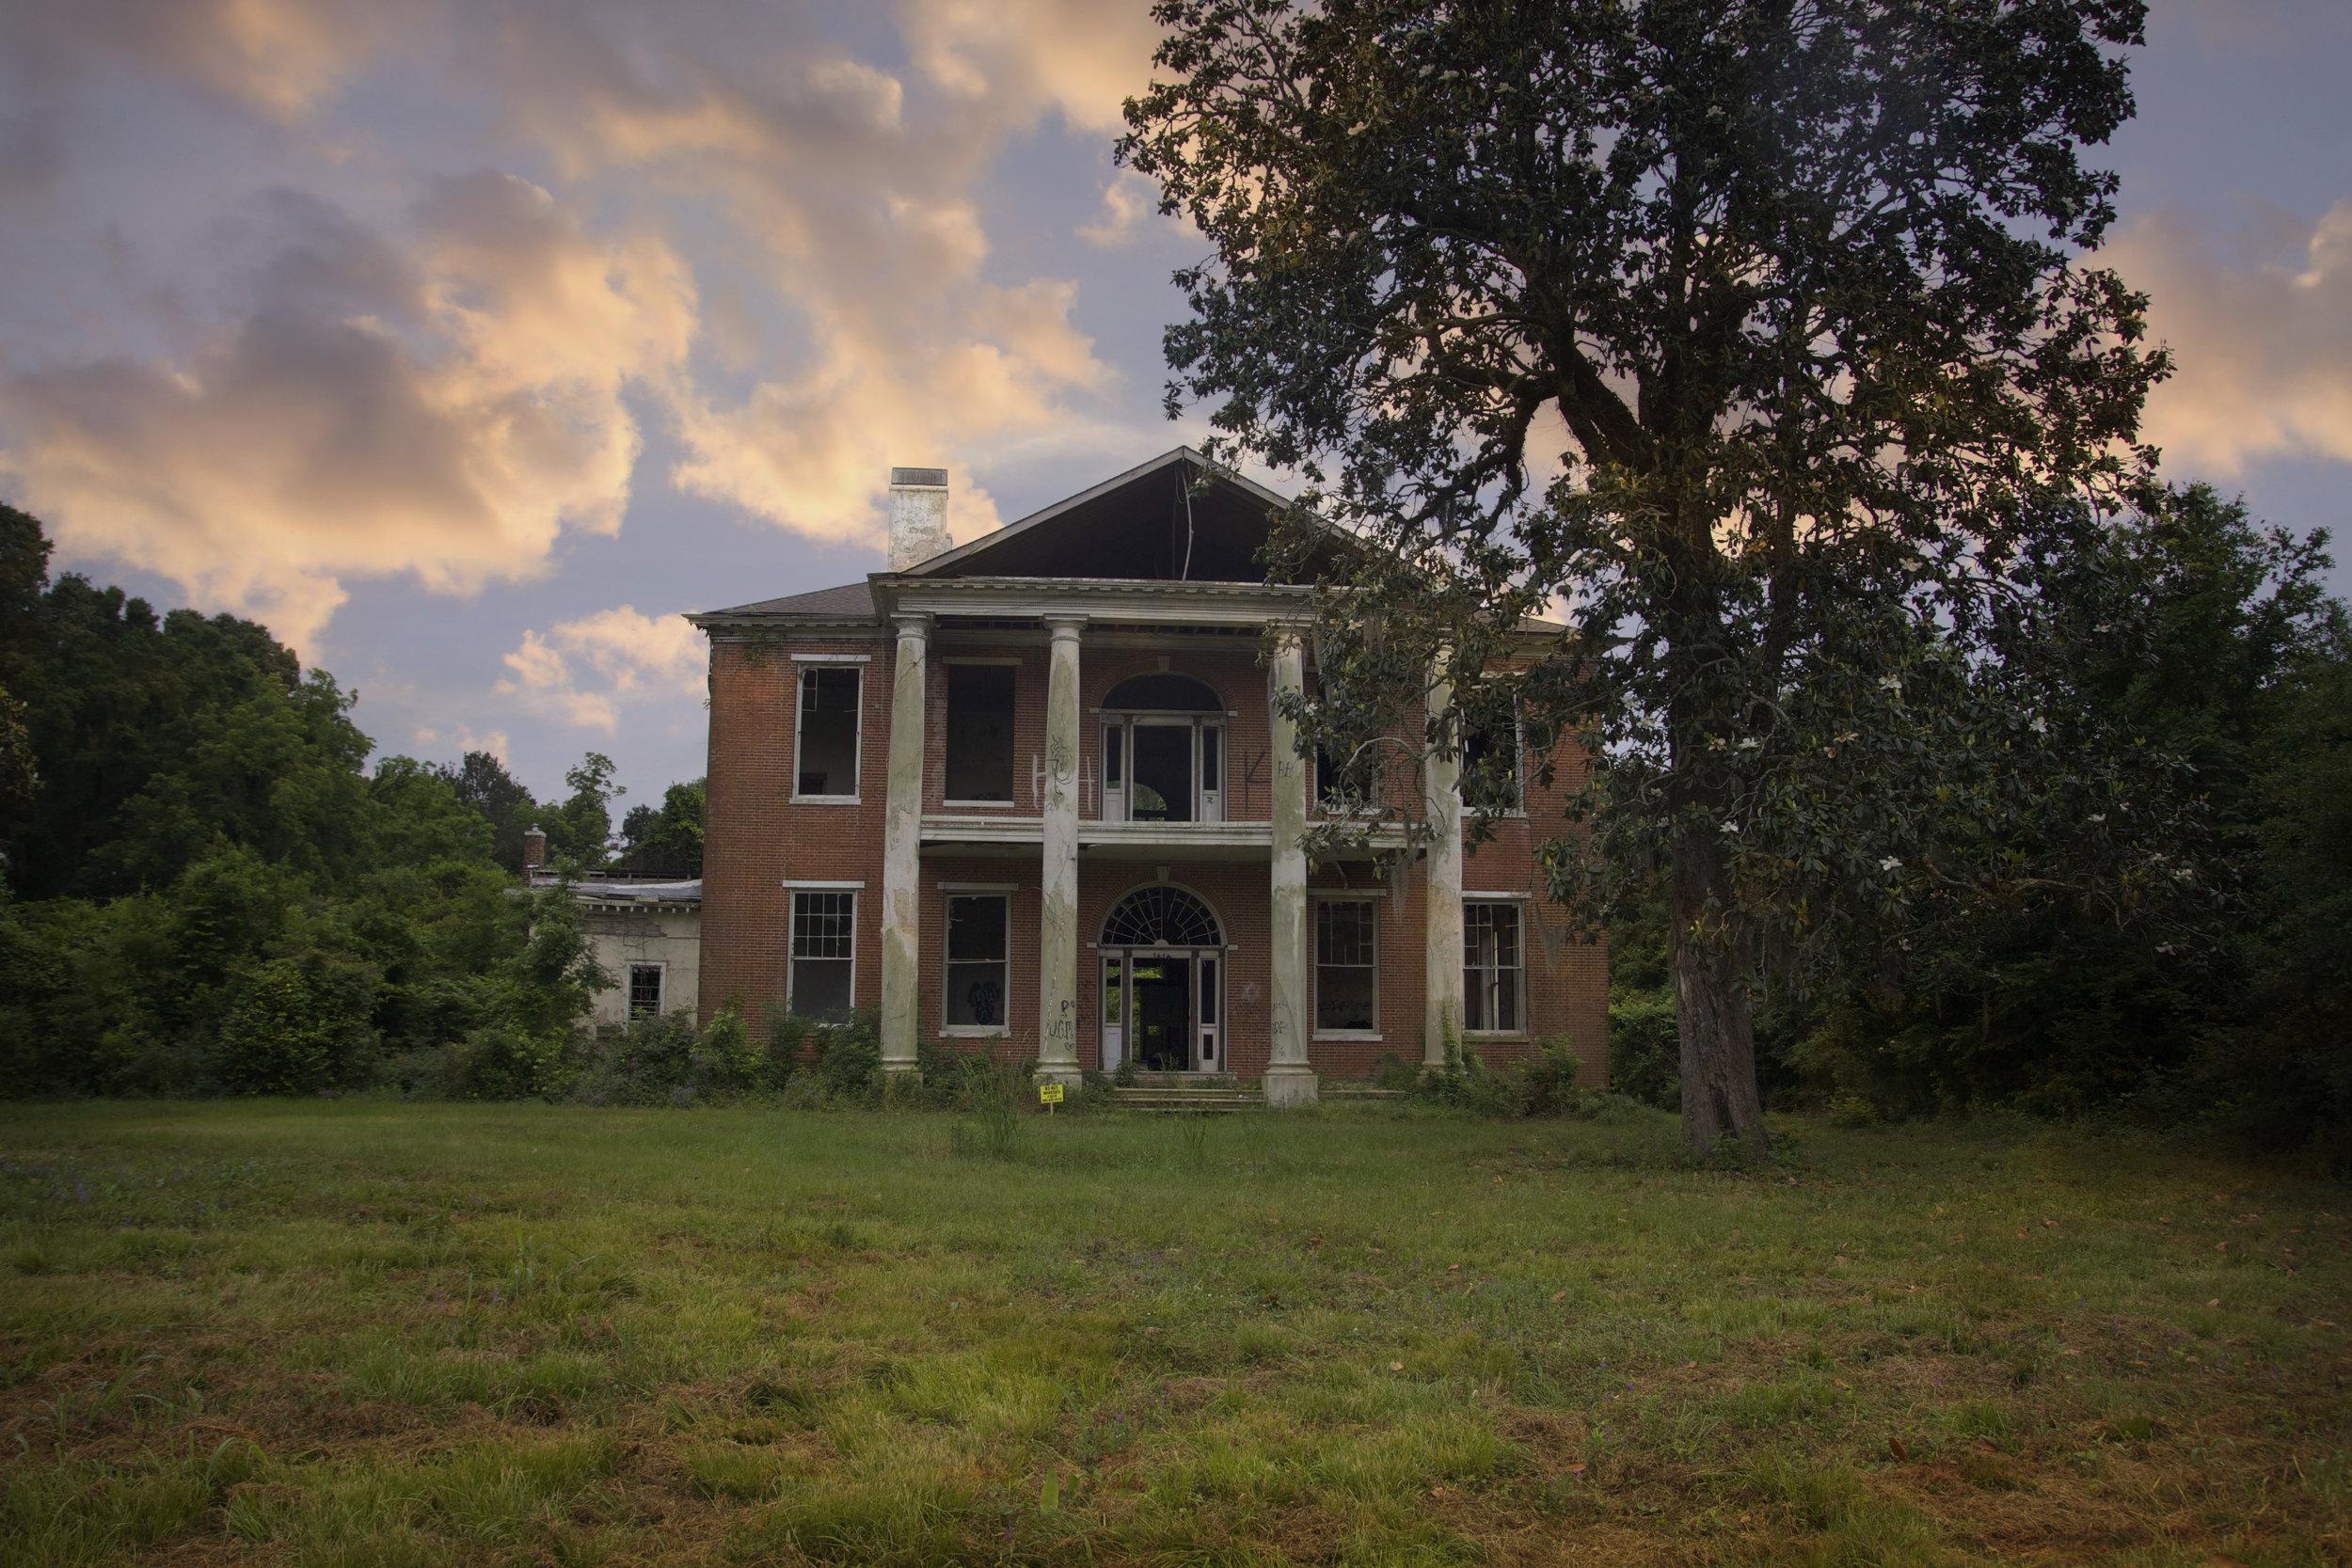 natchez arlington mississippi mansion history photo